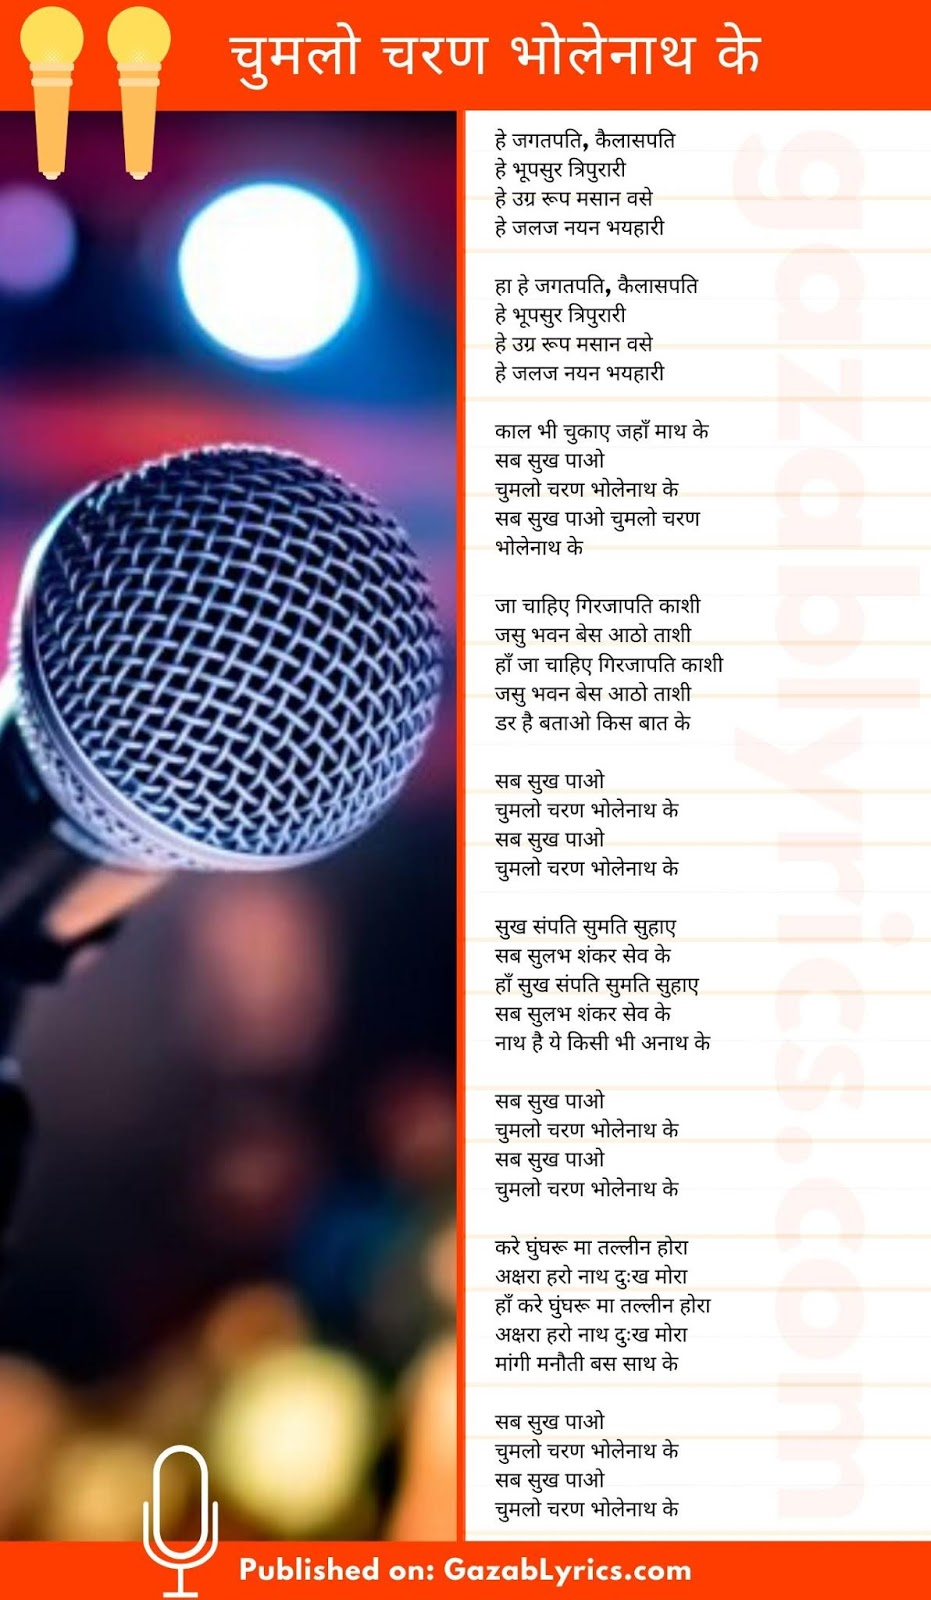 Chum Lo Charan Bhole Nath Ke song lyrics image